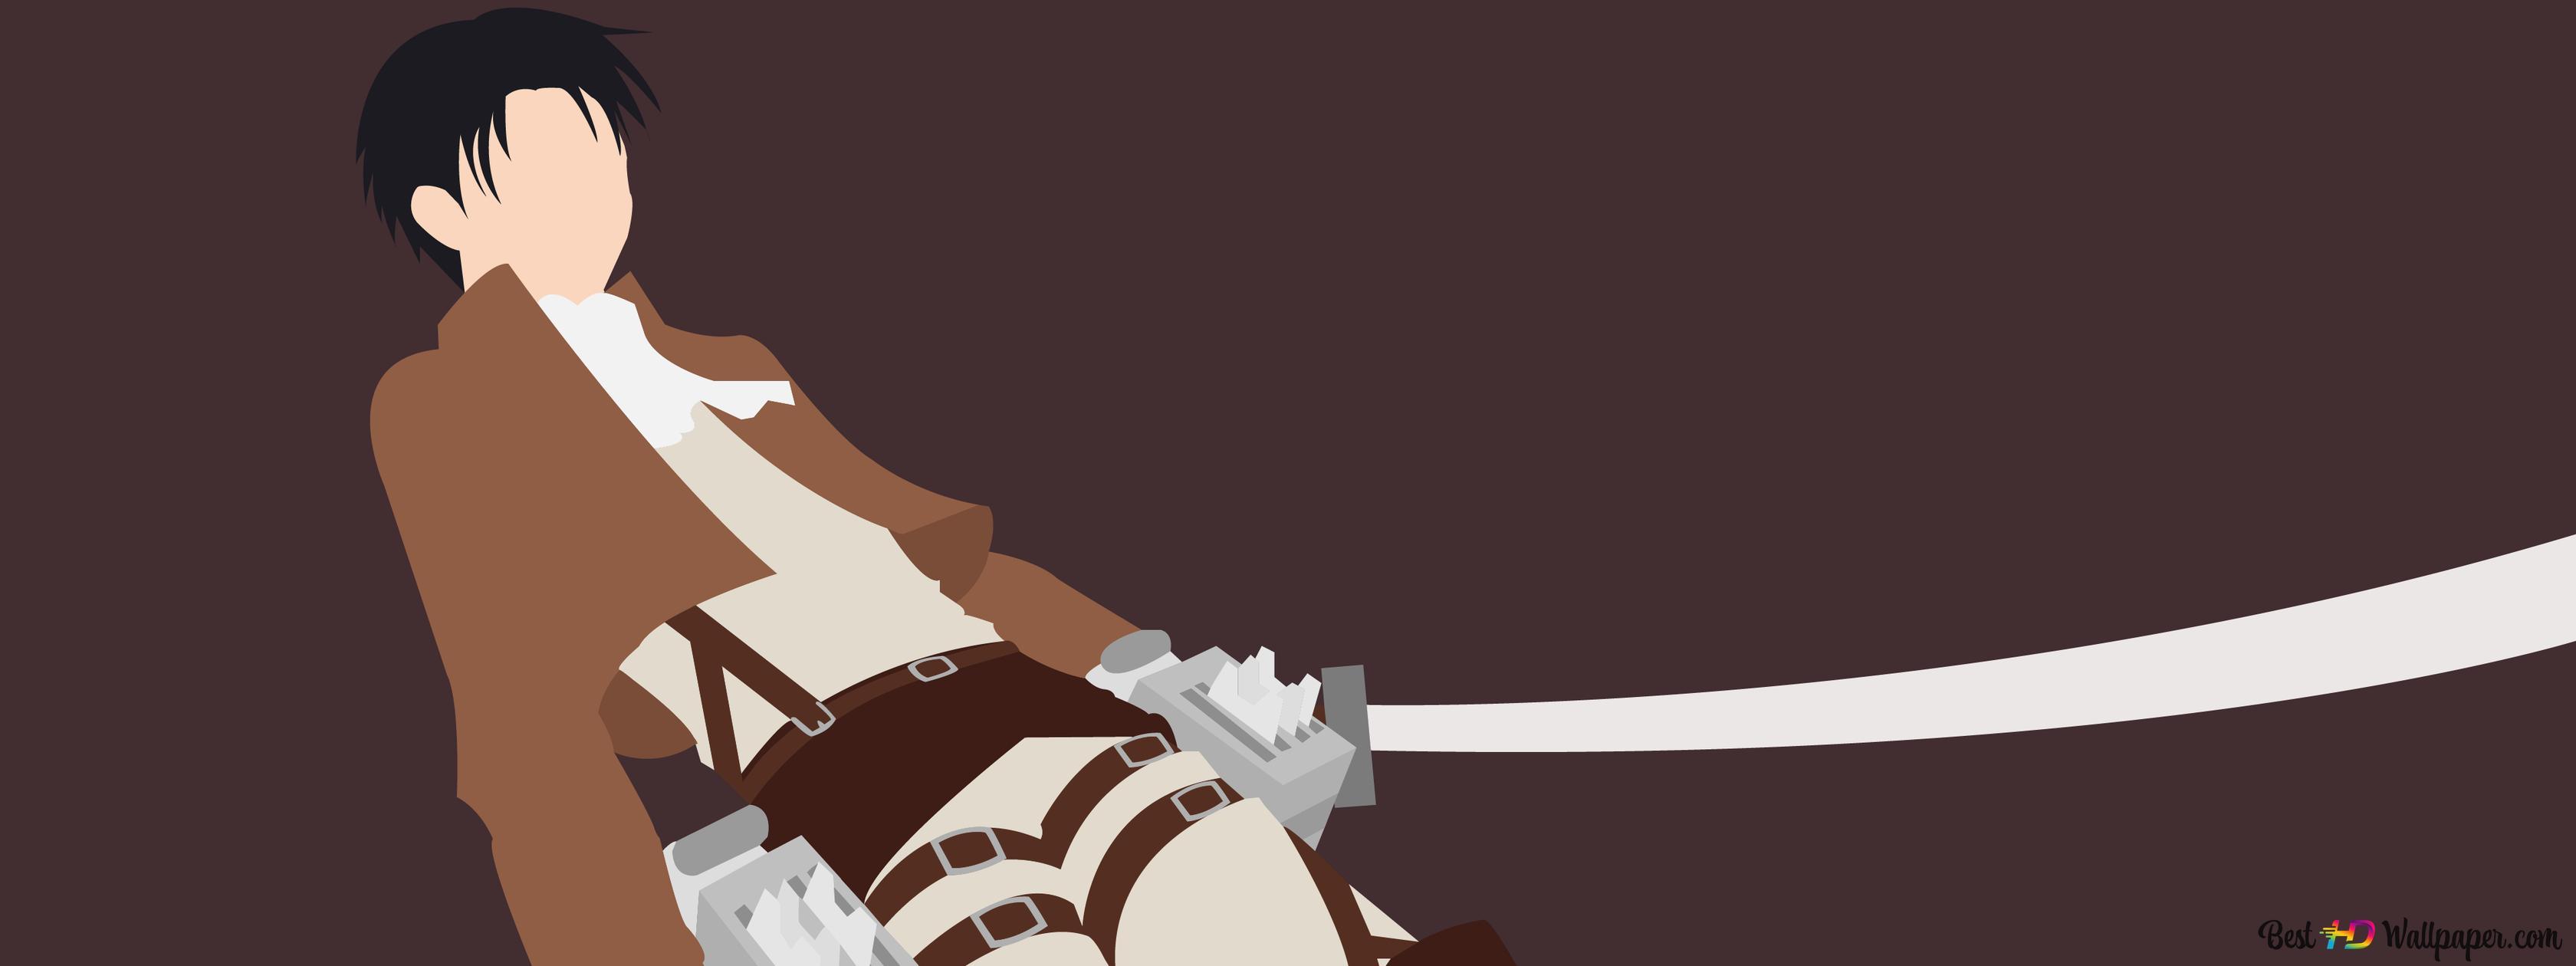 Levi Ackerman Attack On Titan Hd Wallpaper Download